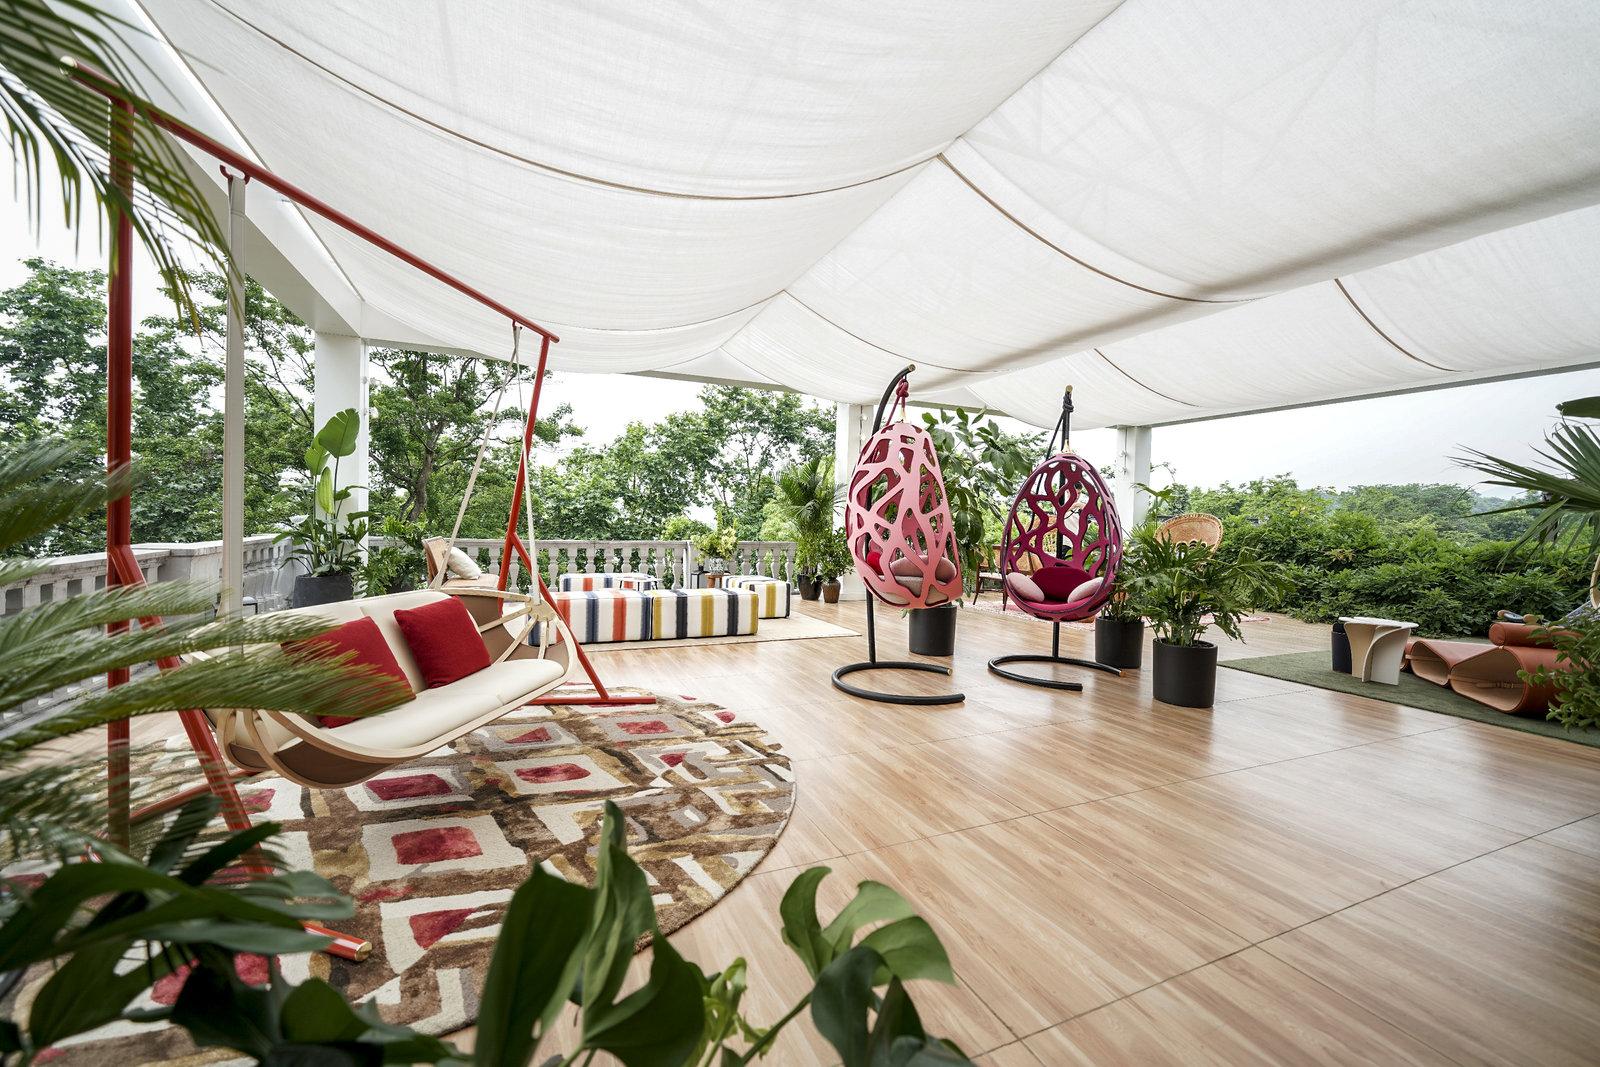 Louis Vuitton Hardsided Event Hangzhou May 28th – Jun 1st 2020 – 7